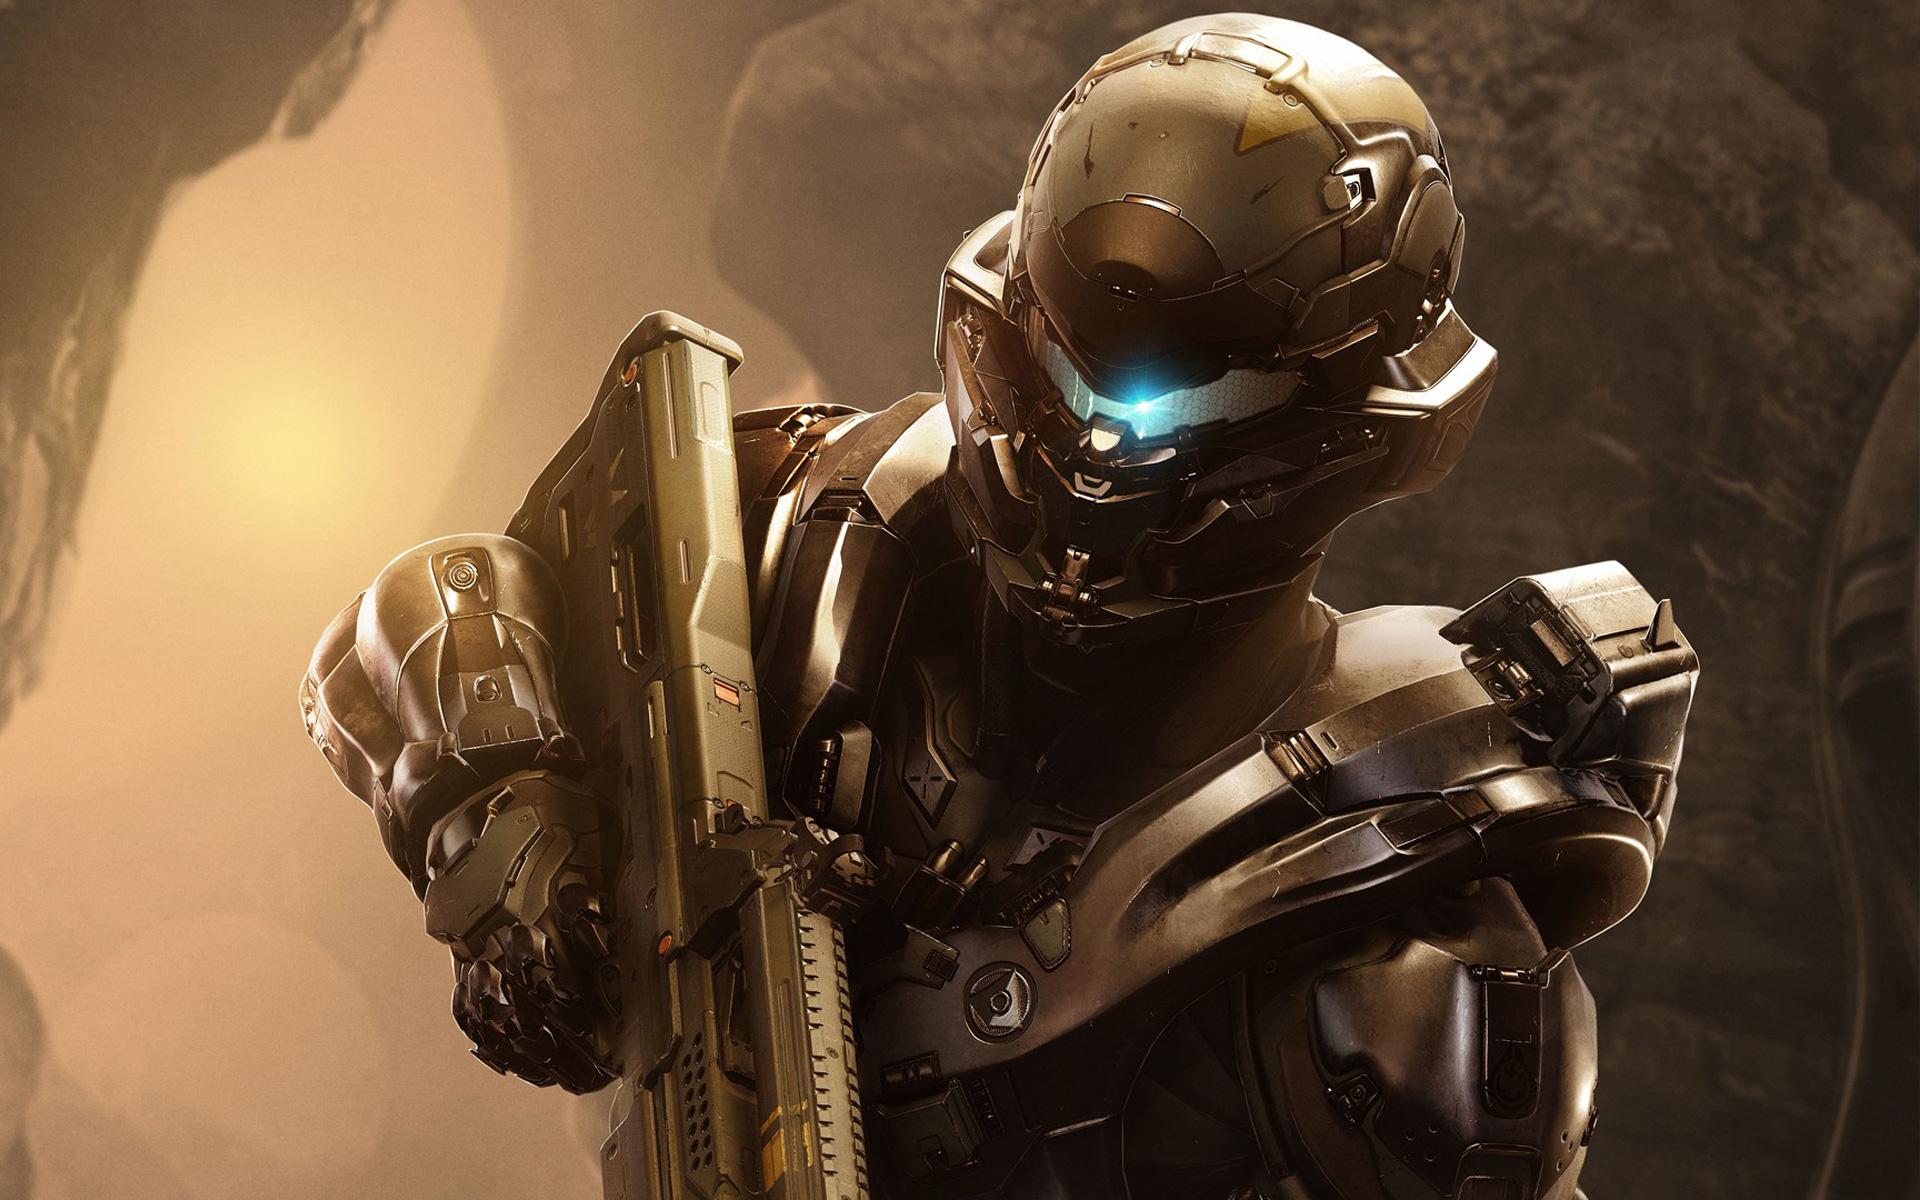 Halo 5 Guardians Wallpaper in 1920x1200 1920x1200